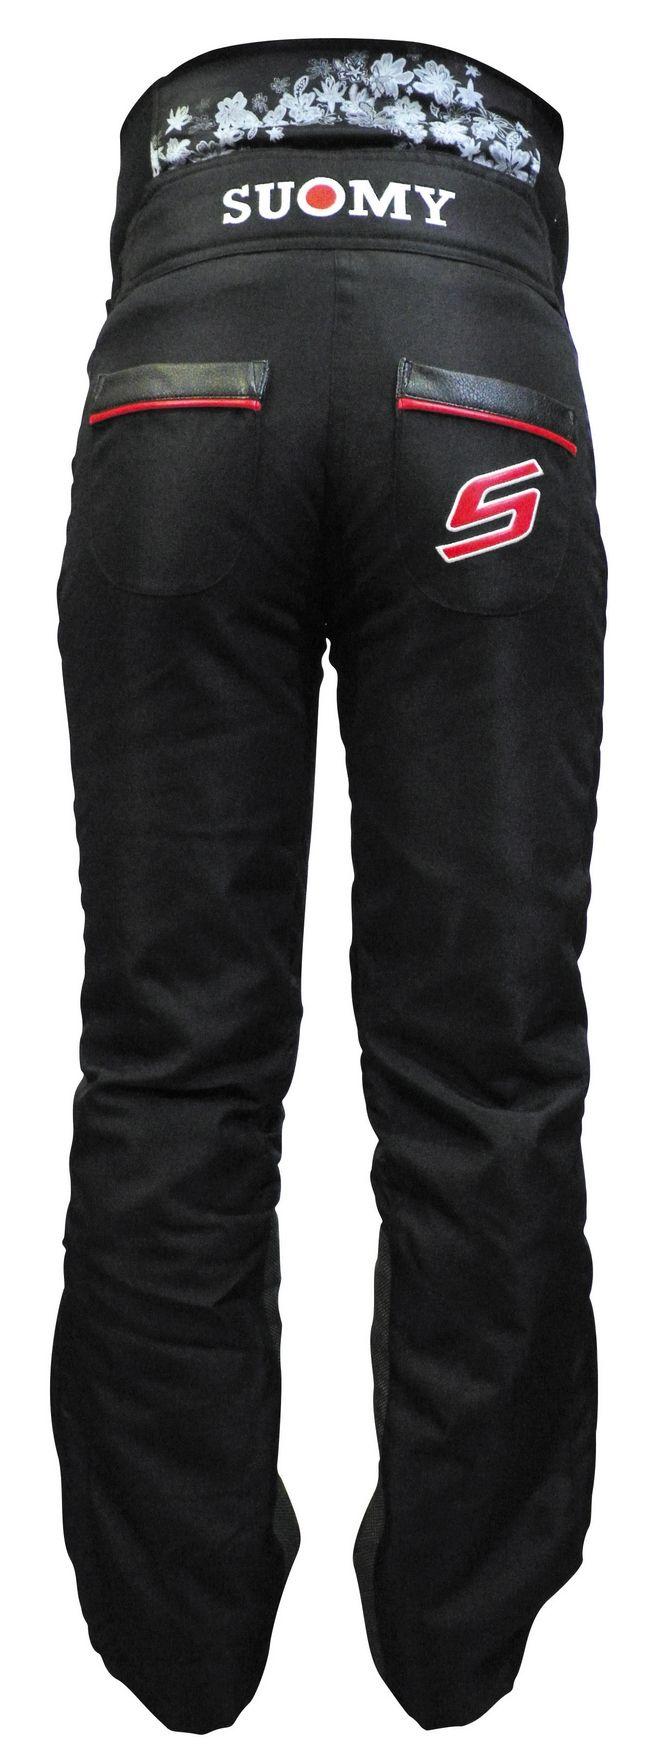 【SUOMY】LD車褲 5 - 「Webike-摩托百貨」